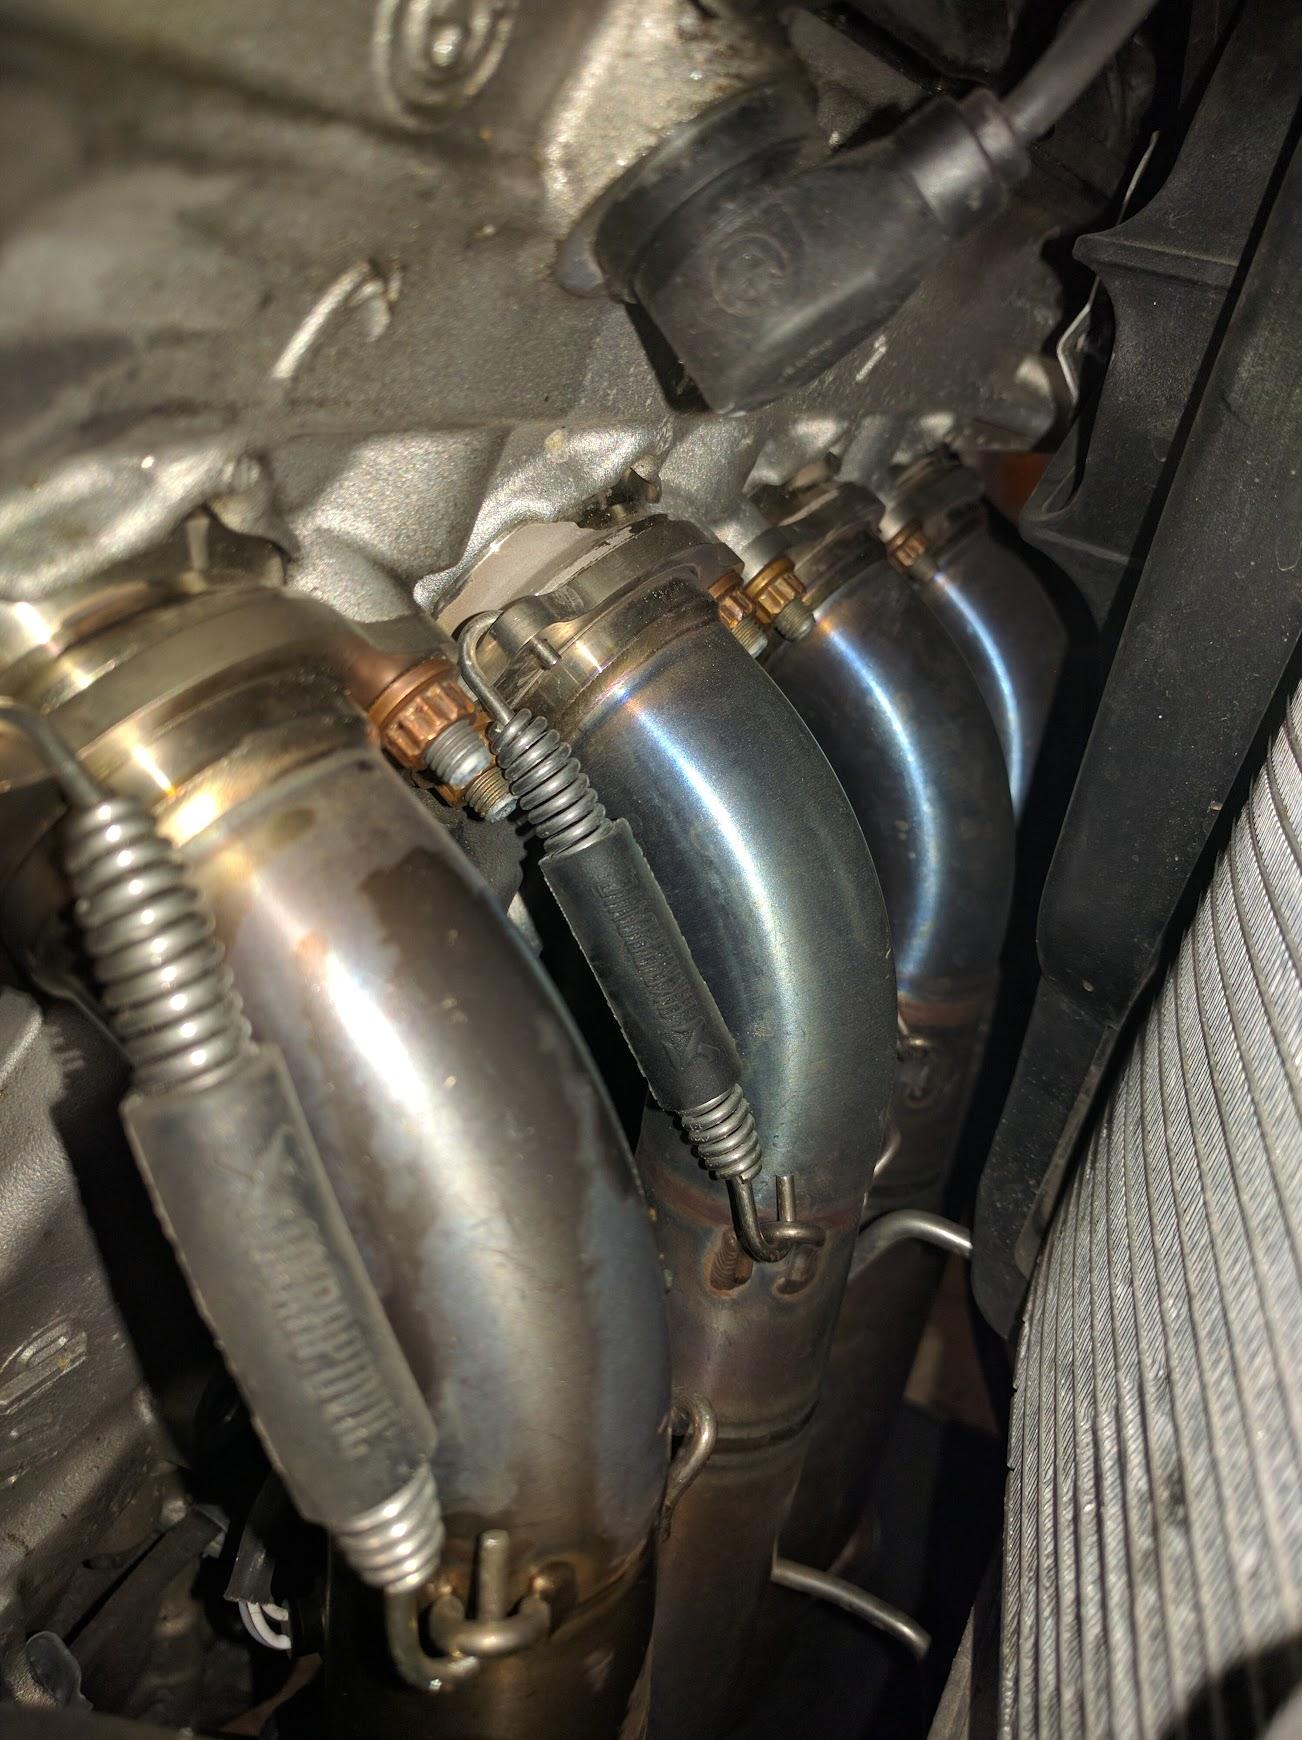 Have i blown my engine?? - The MotorBike Forum